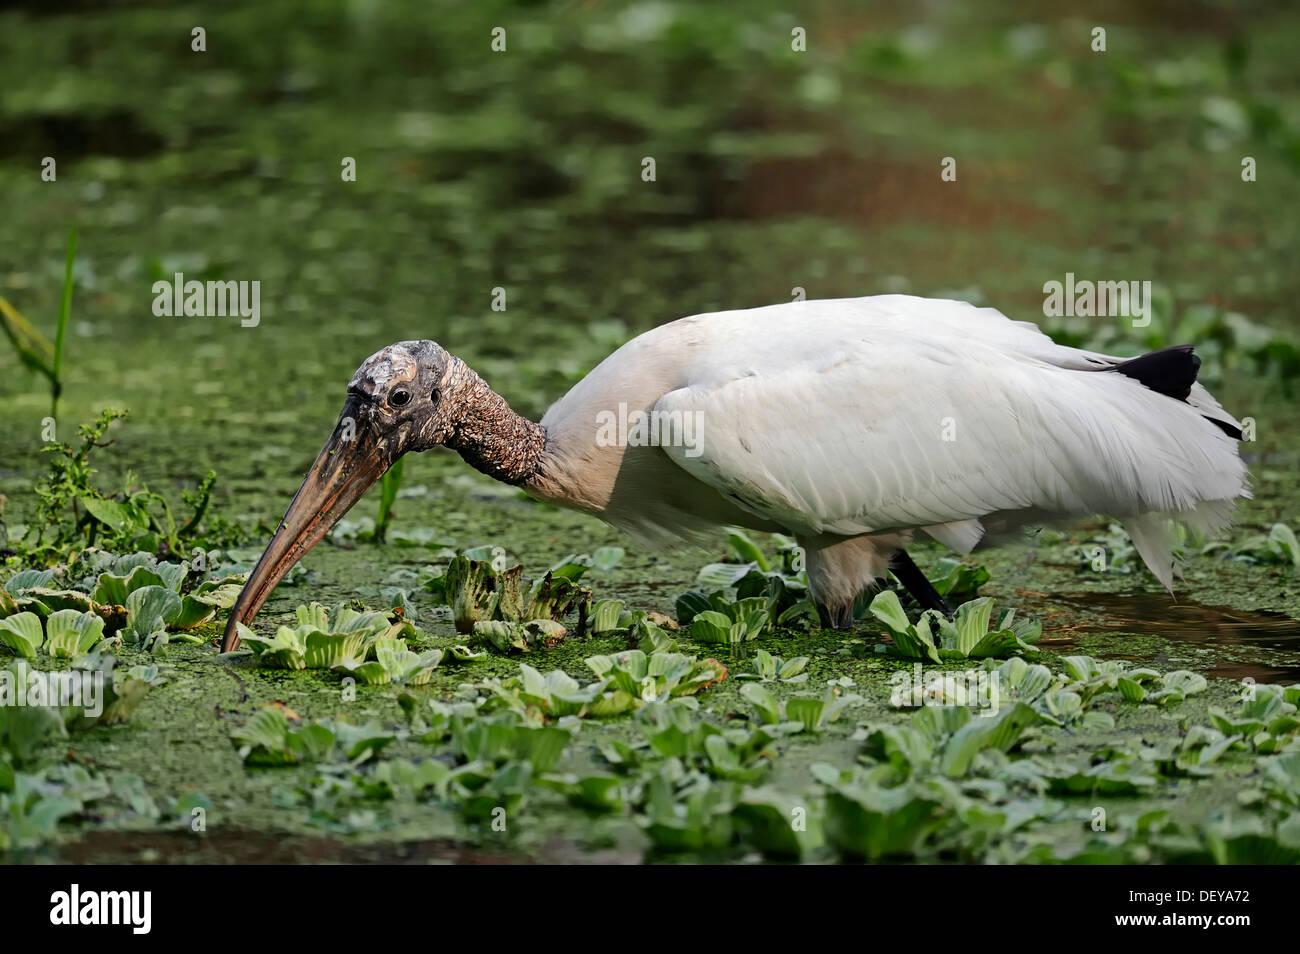 Wood Stork (Mycteria americana) in search of food, Corkscrew Swamp Sanctuary, Florida, United States - Stock Image